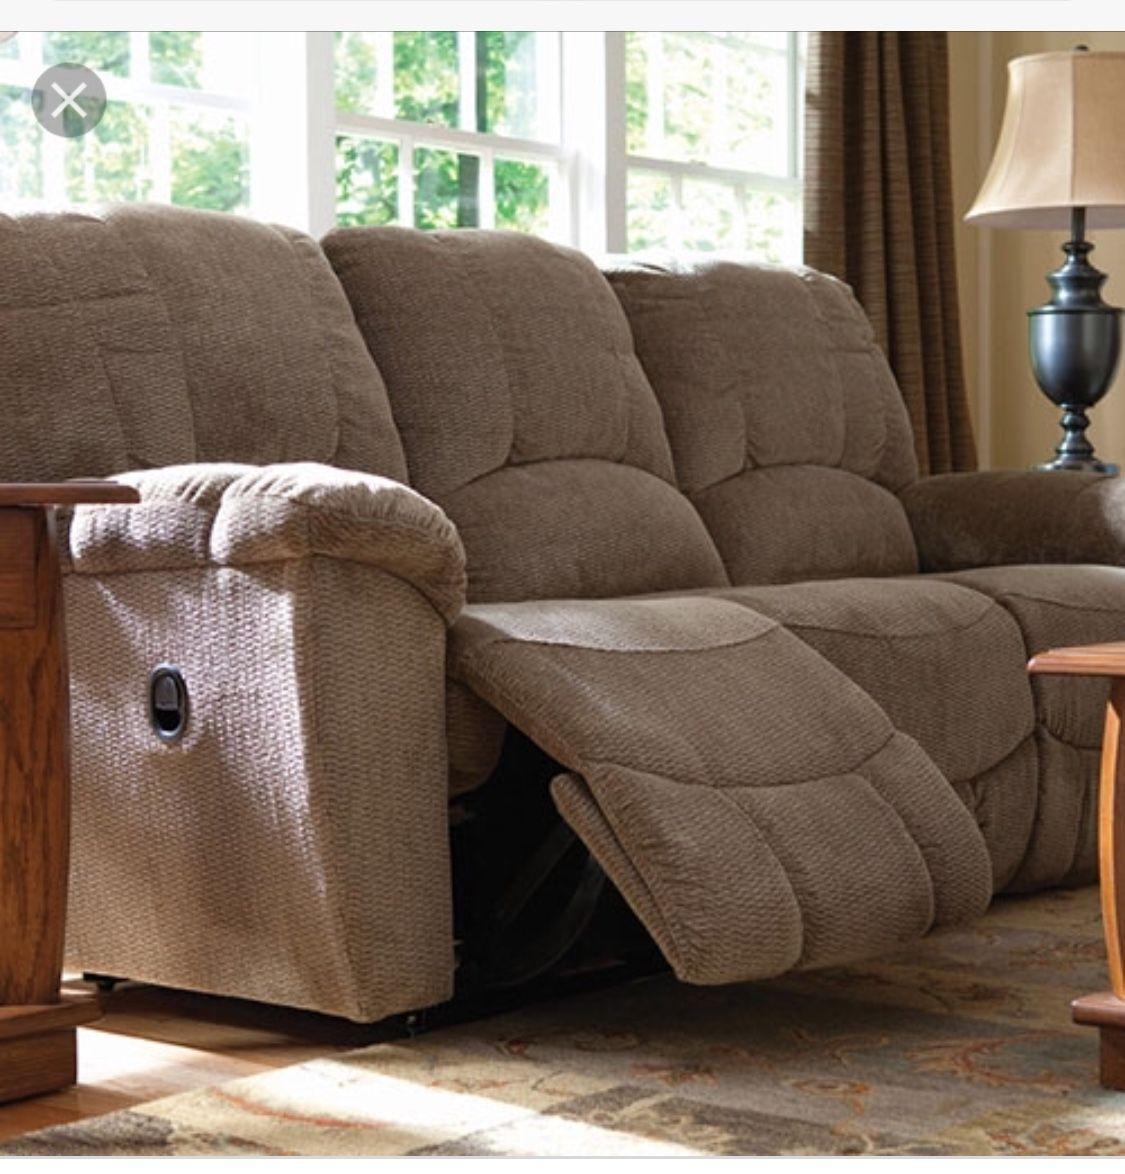 Pin by Kris Boeke on The Big 6Oh! Lazy boy sofas